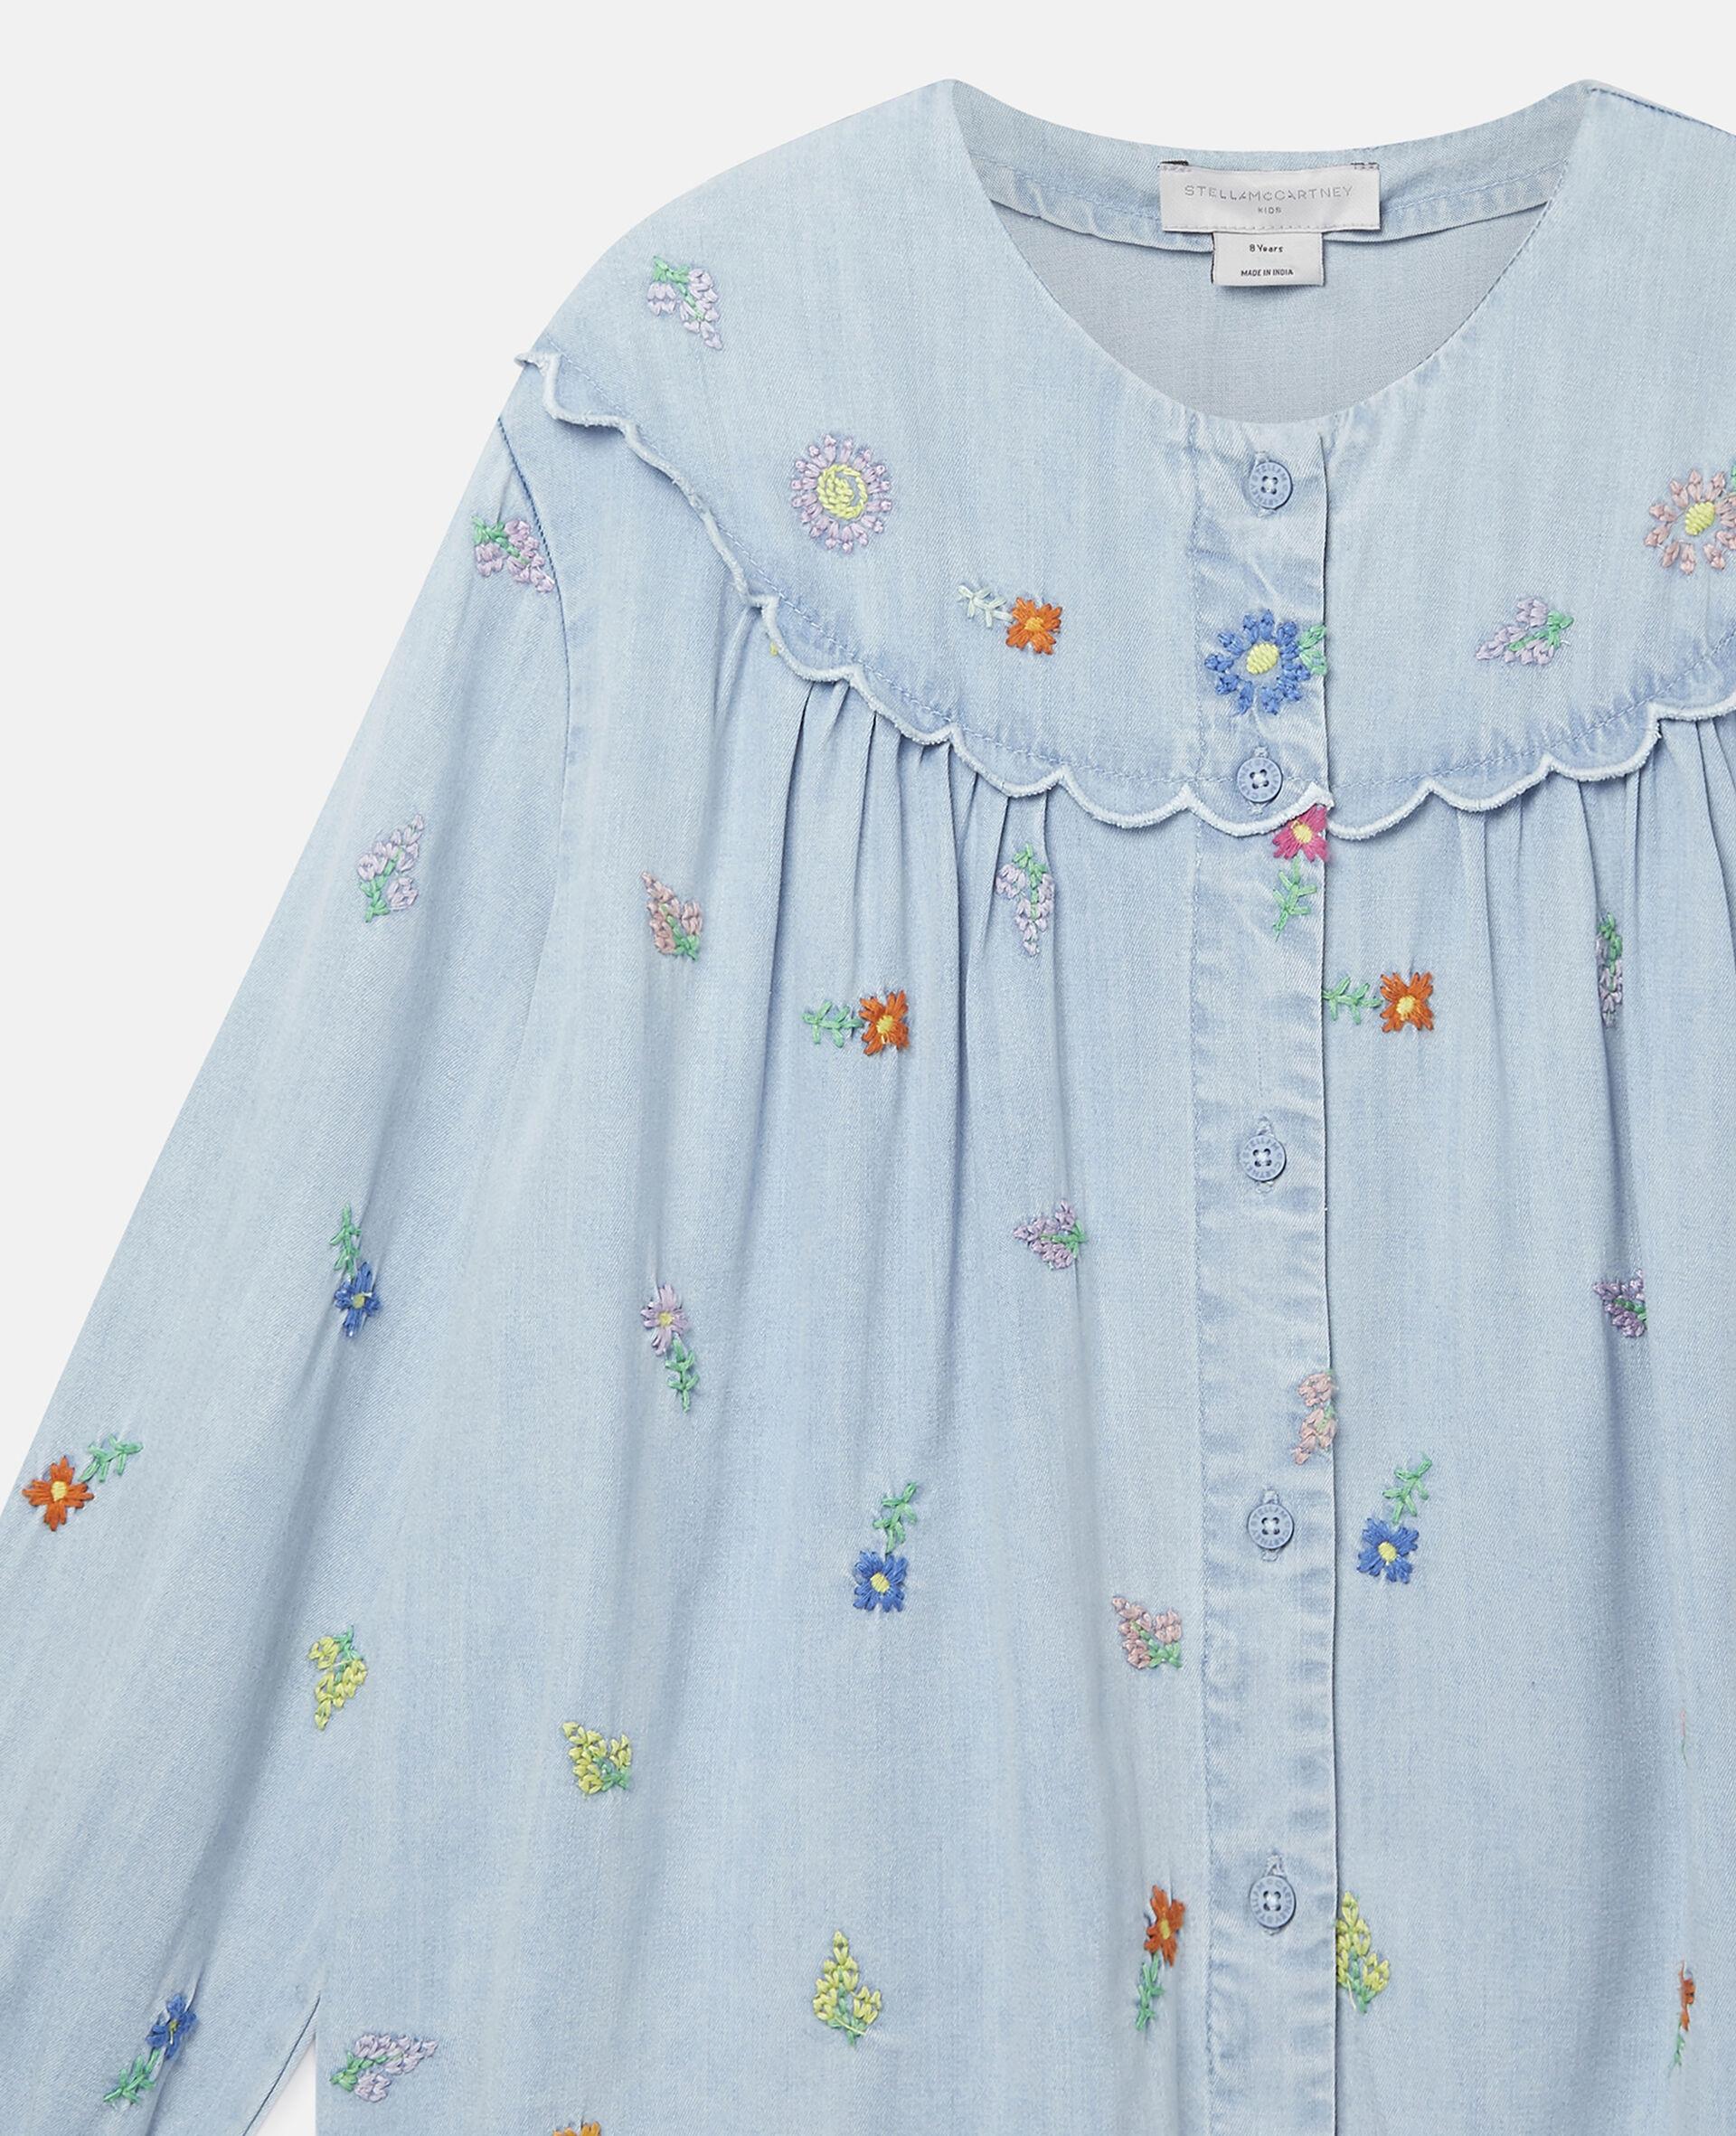 Embroidered Flowers Denim Shirt-Blue-large image number 2